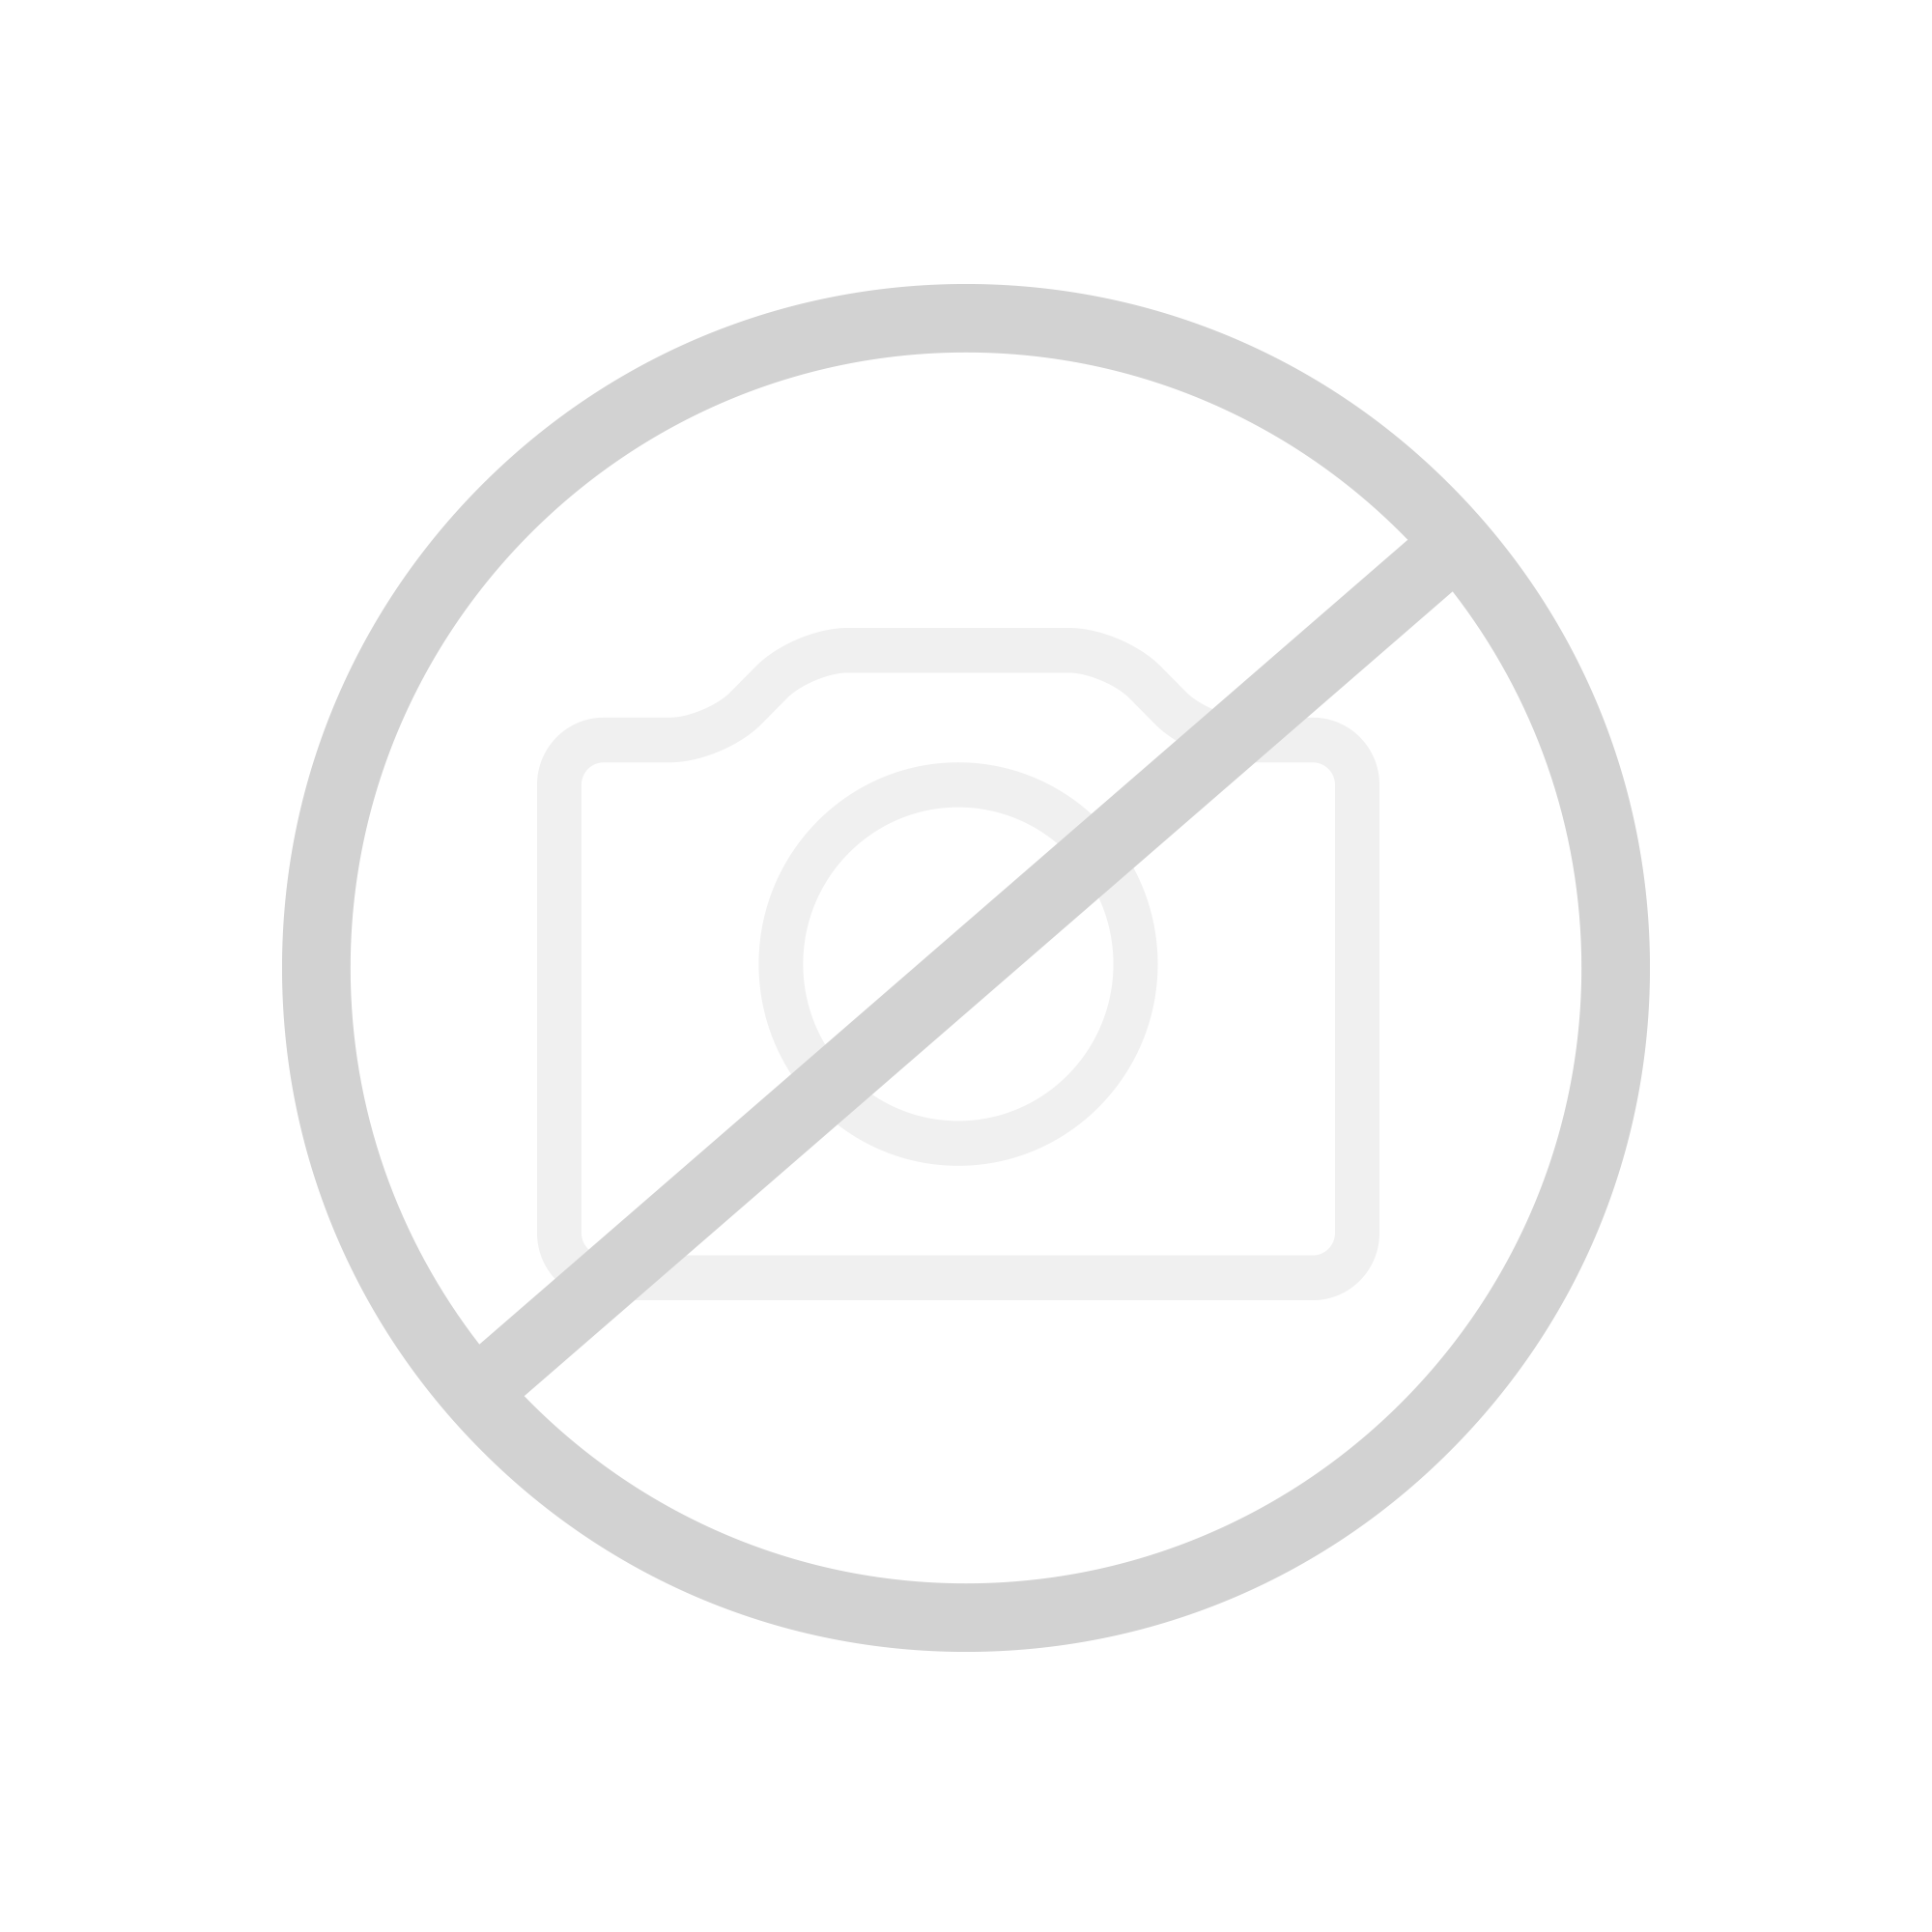 geberit duofix wand wc montageelement 111300005 reuter. Black Bedroom Furniture Sets. Home Design Ideas